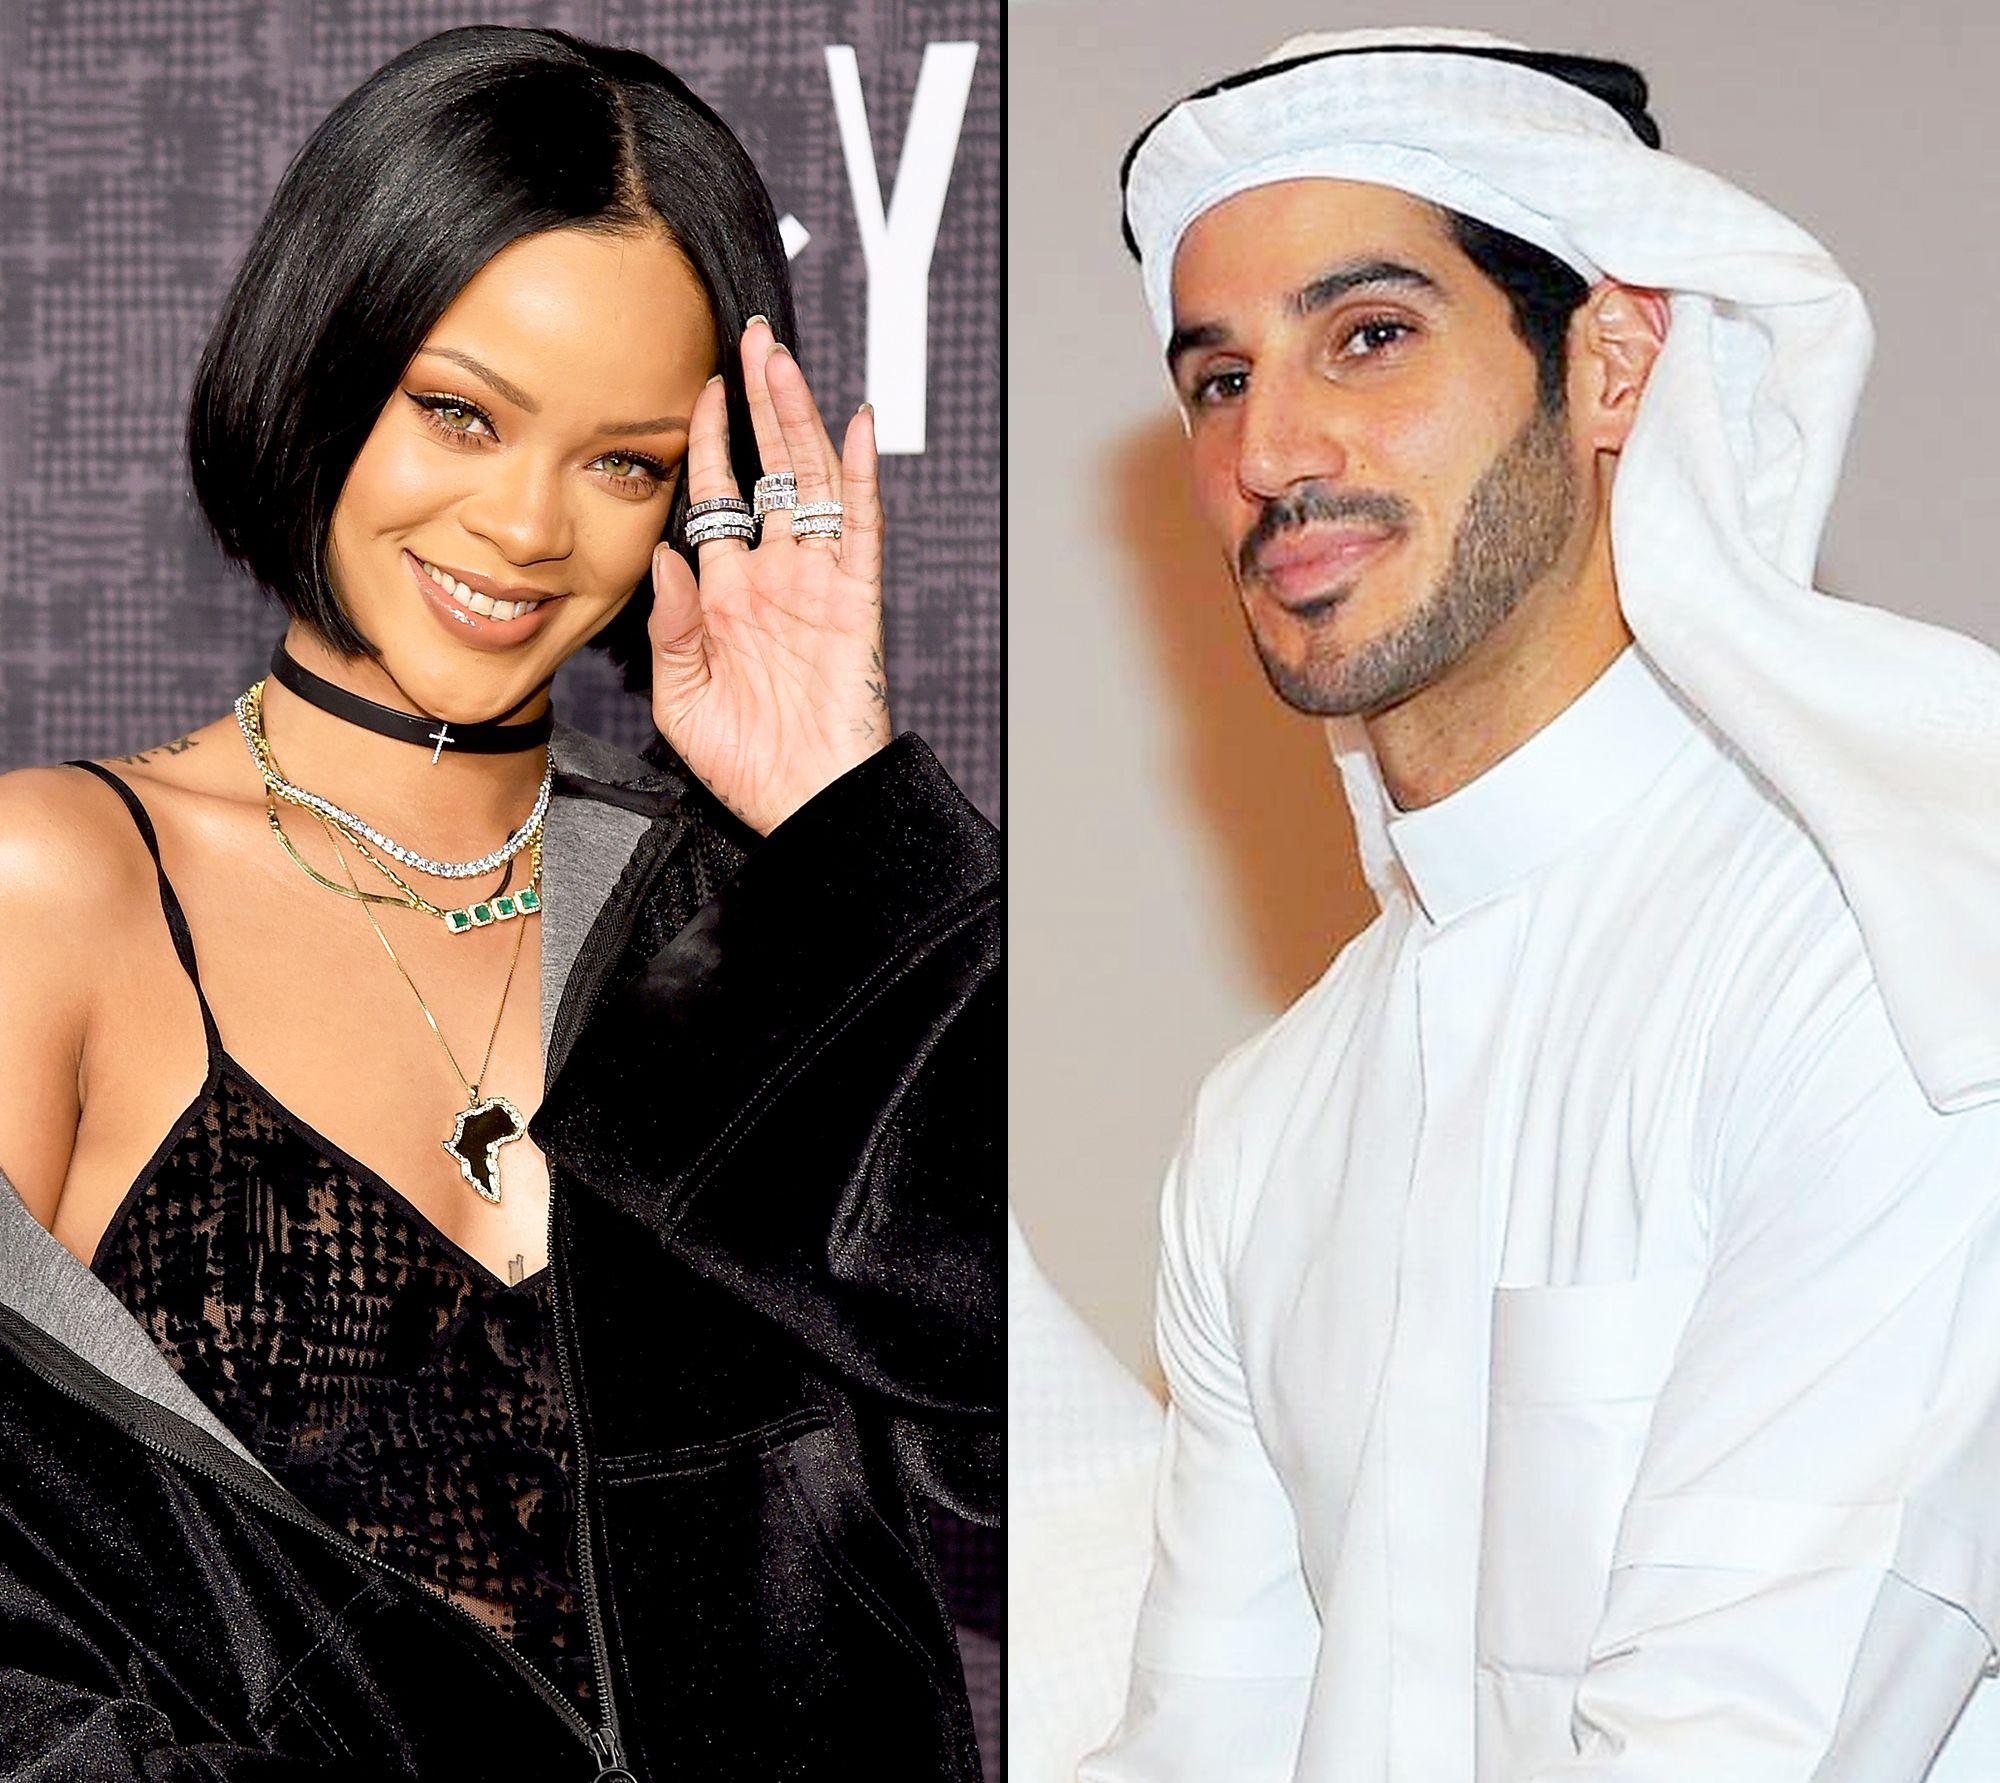 [PHOTOS] Rihanna And Billionaire Boyfriend Hassan Jameel